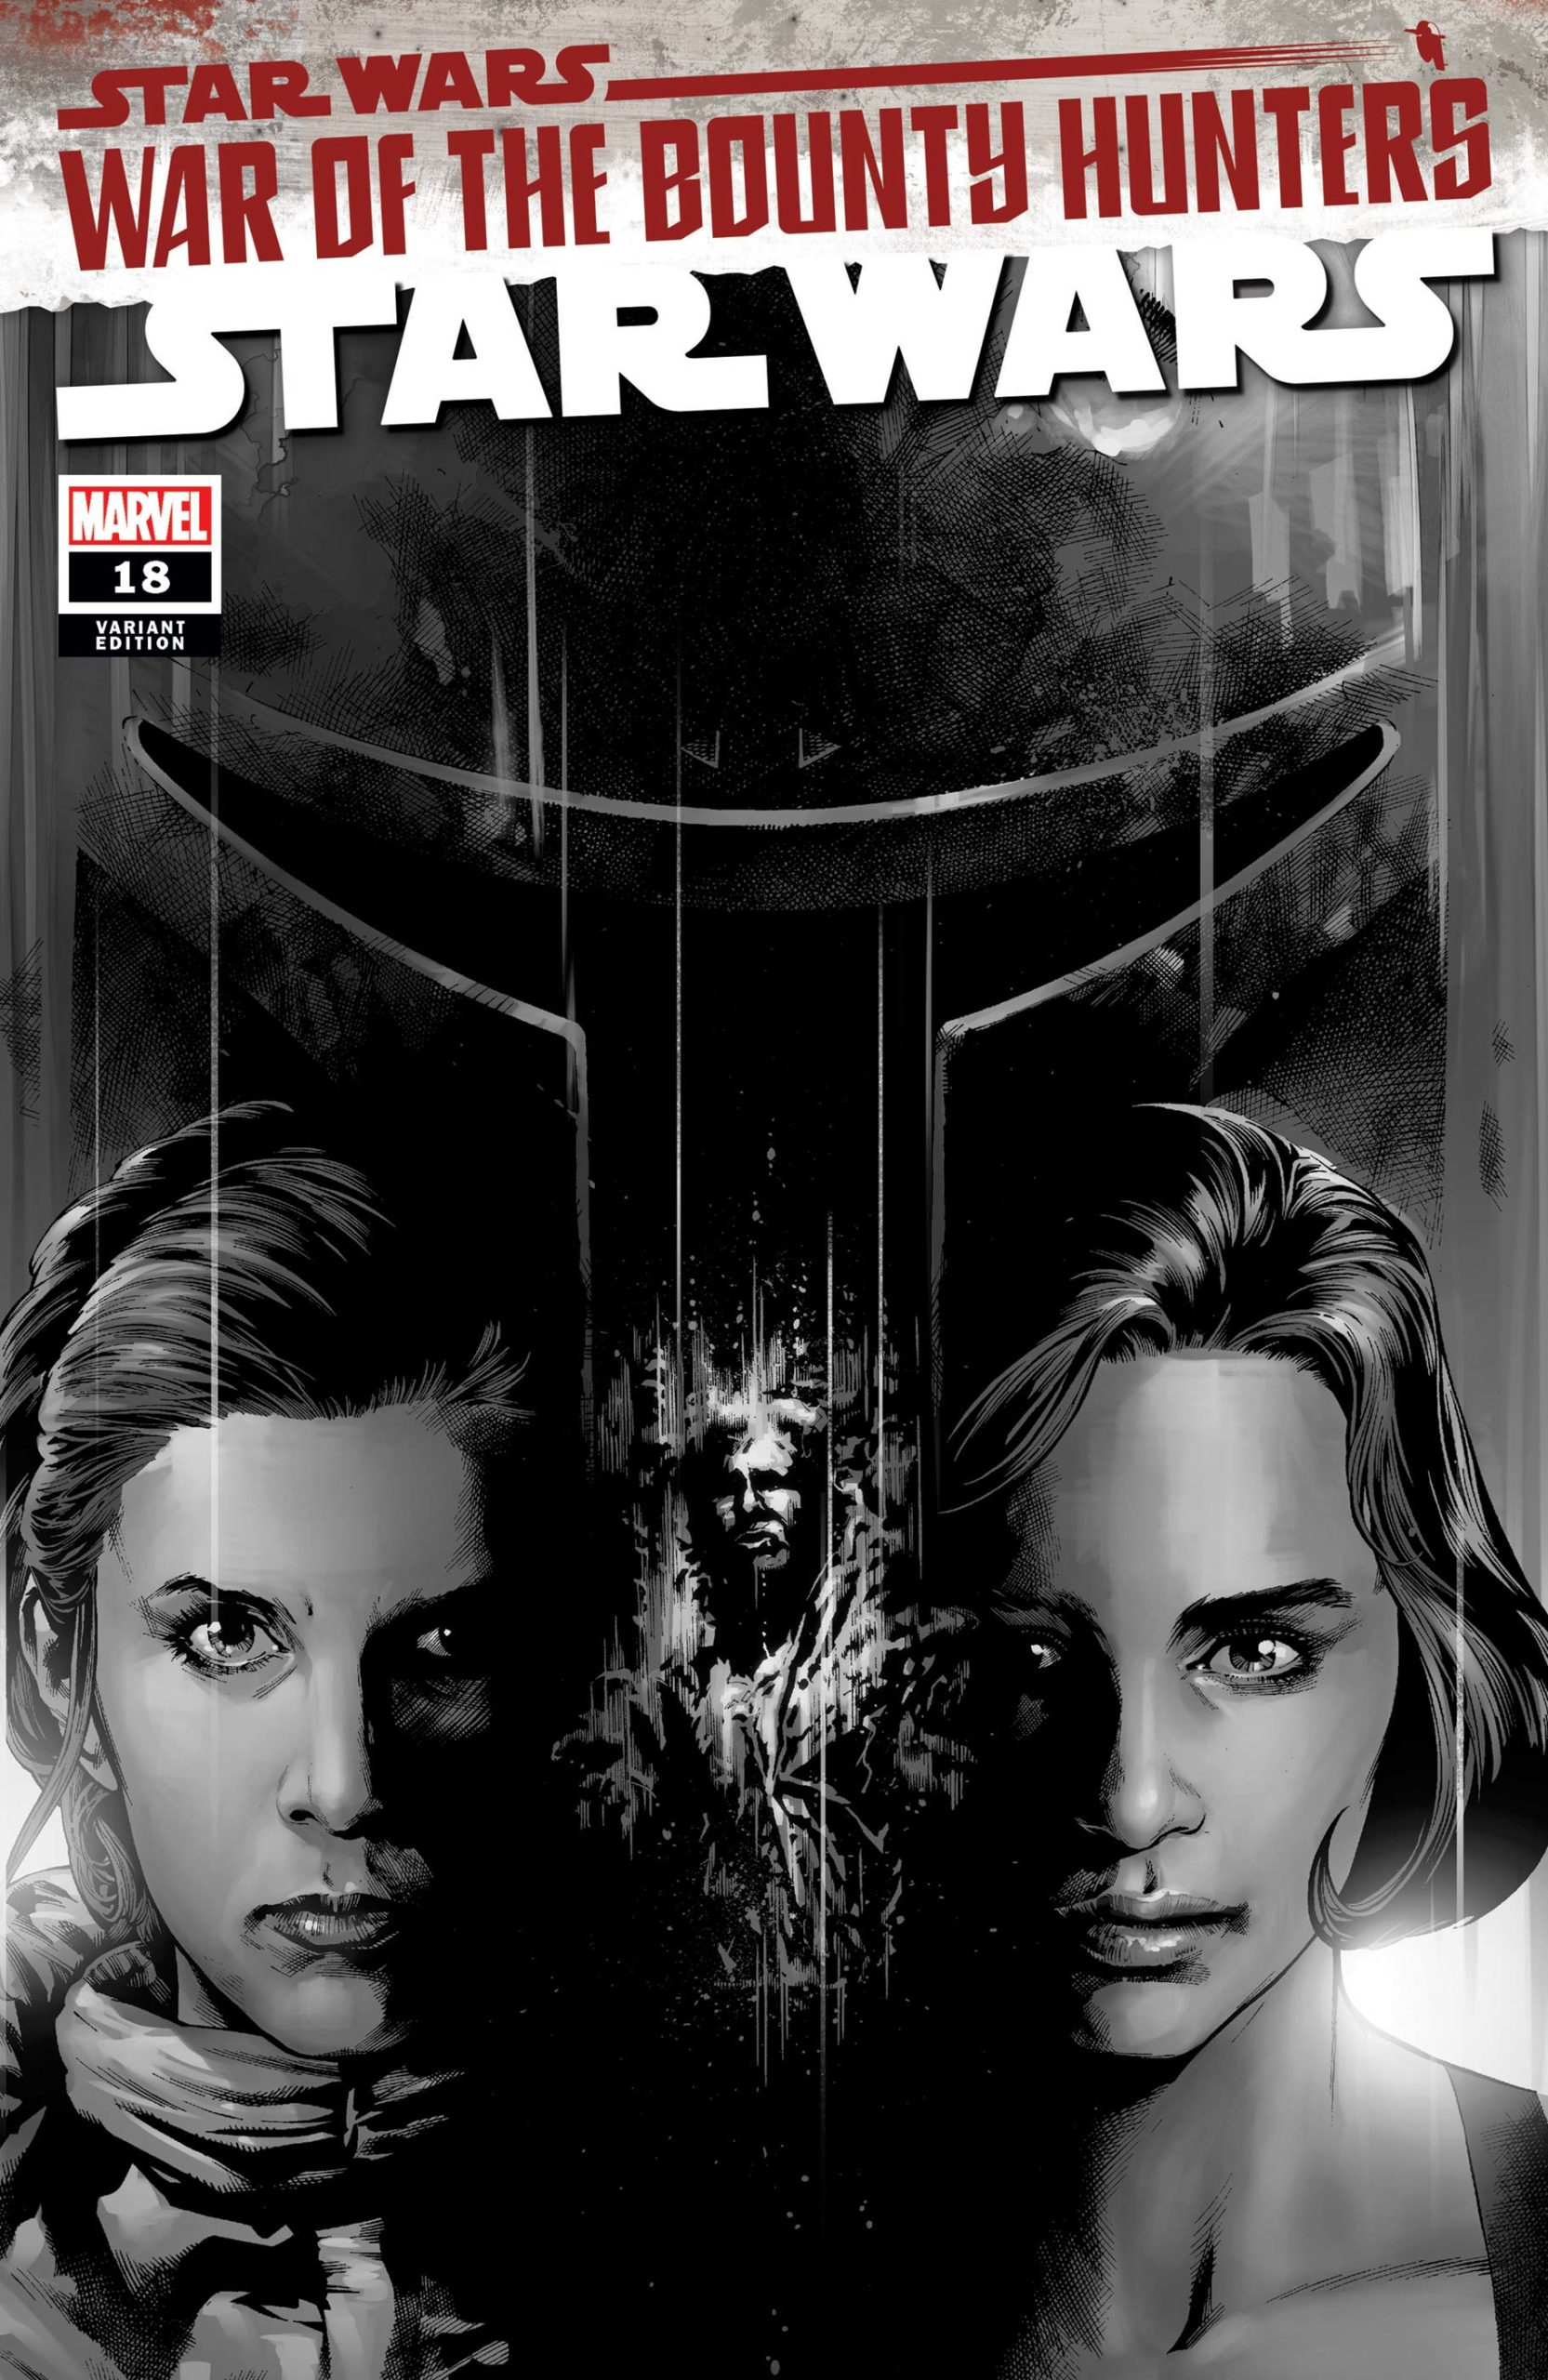 Star Wars #18 (Carlo Pagulayan Carbonite Variant Cover) (27.10.2021)